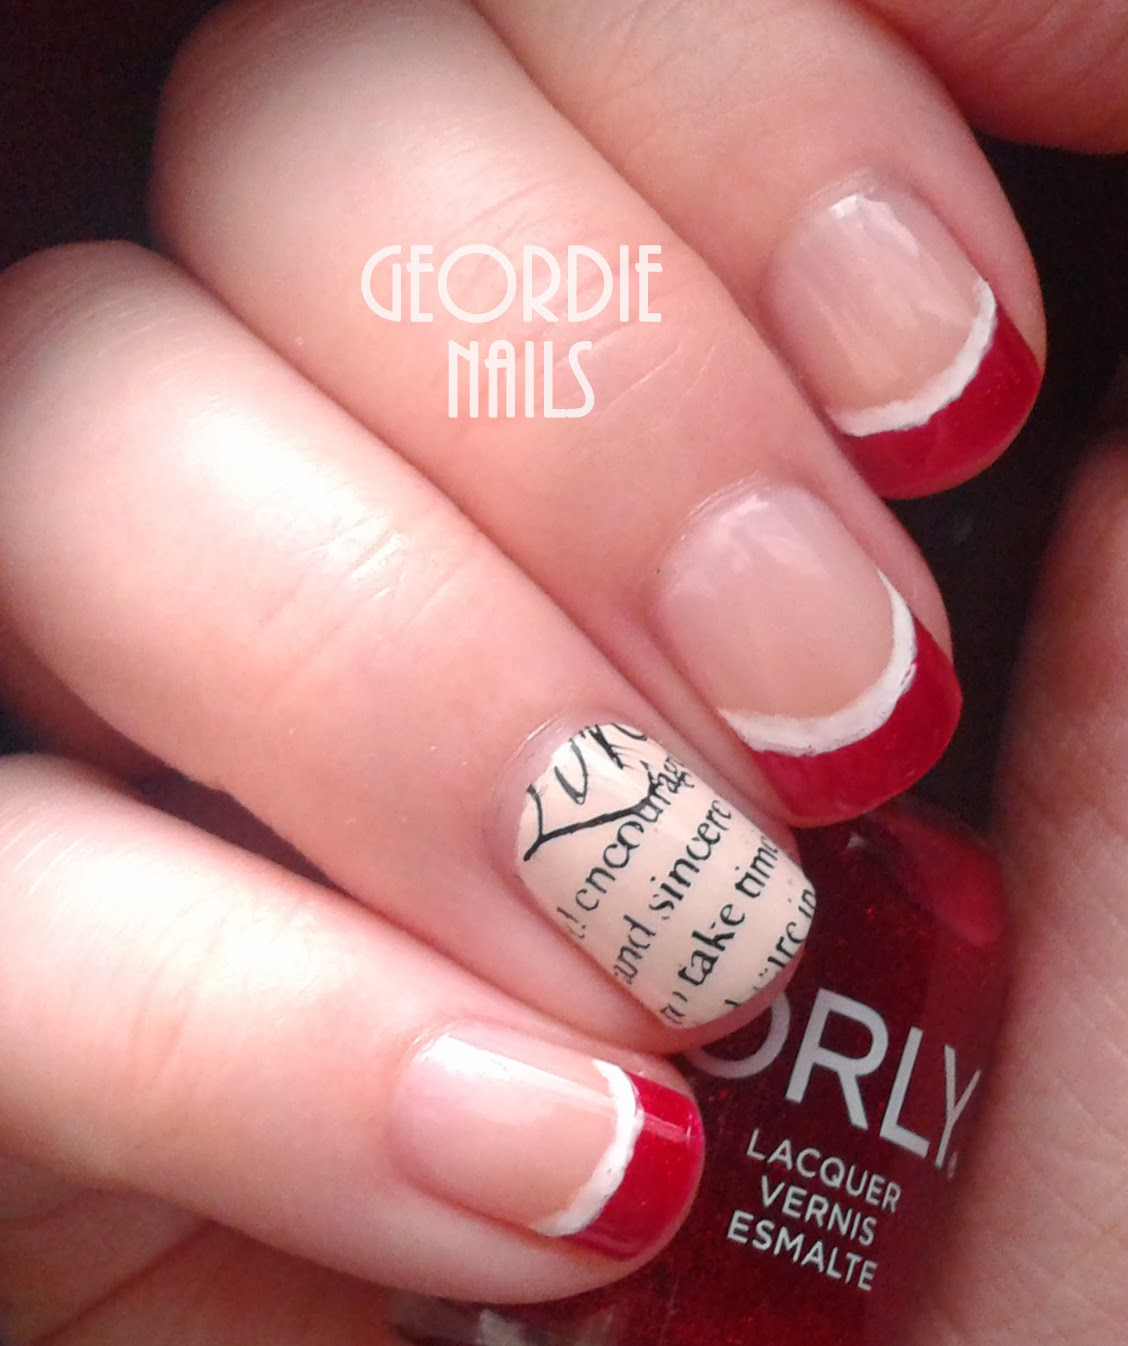 Geordie nails letter to santa manicure letter to santa manicure spiritdancerdesigns Images